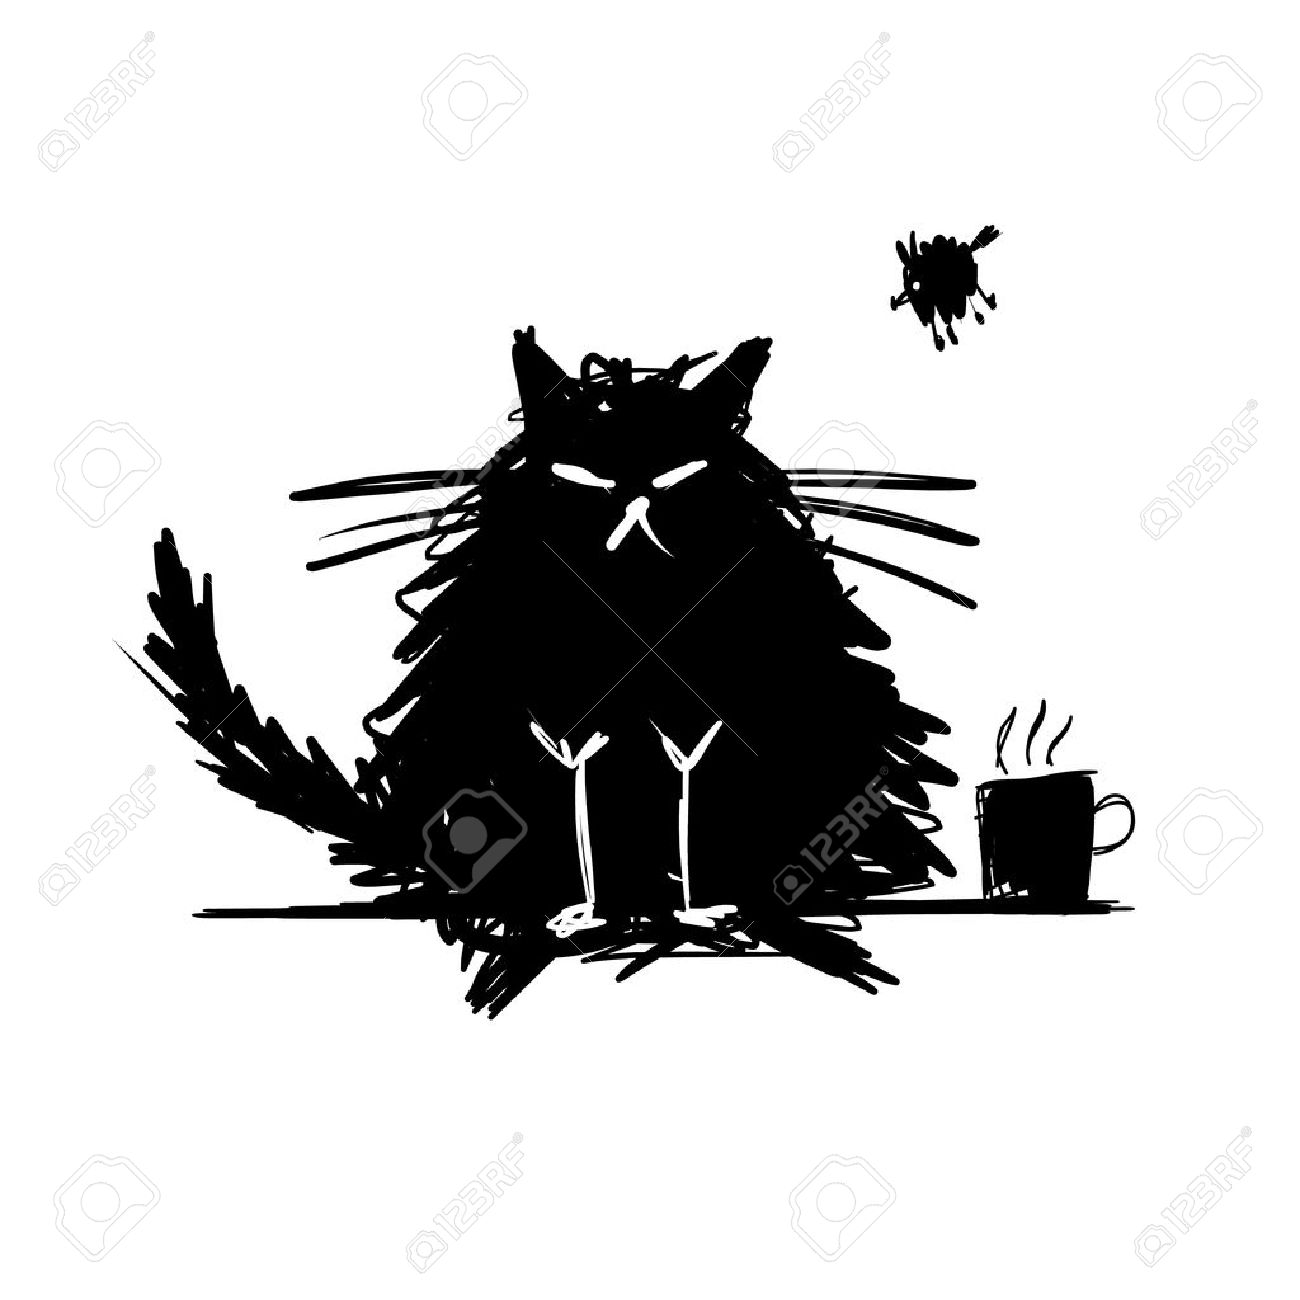 Funny cat black silhouette. Sketch for your design. Vector illustration Foto de archivo - 44222941